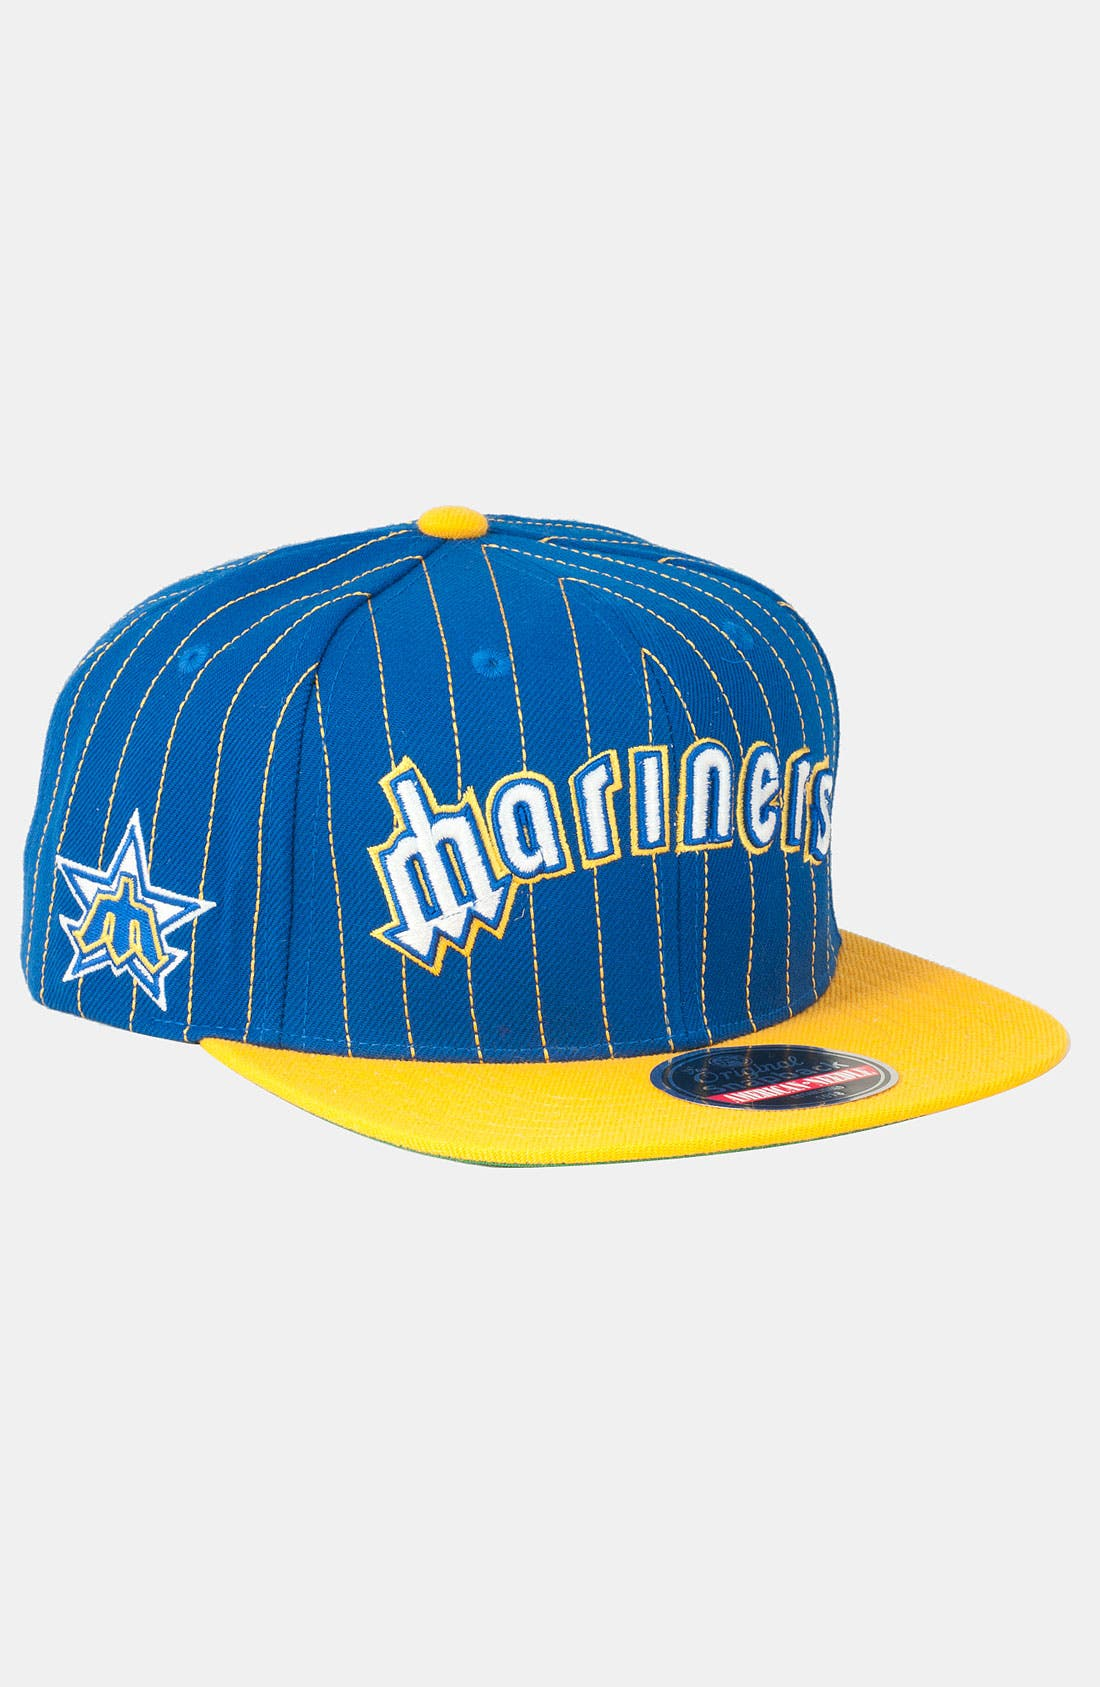 Alternate Image 1 Selected - American Needle 'Mariners' Snapback Baseball Cap